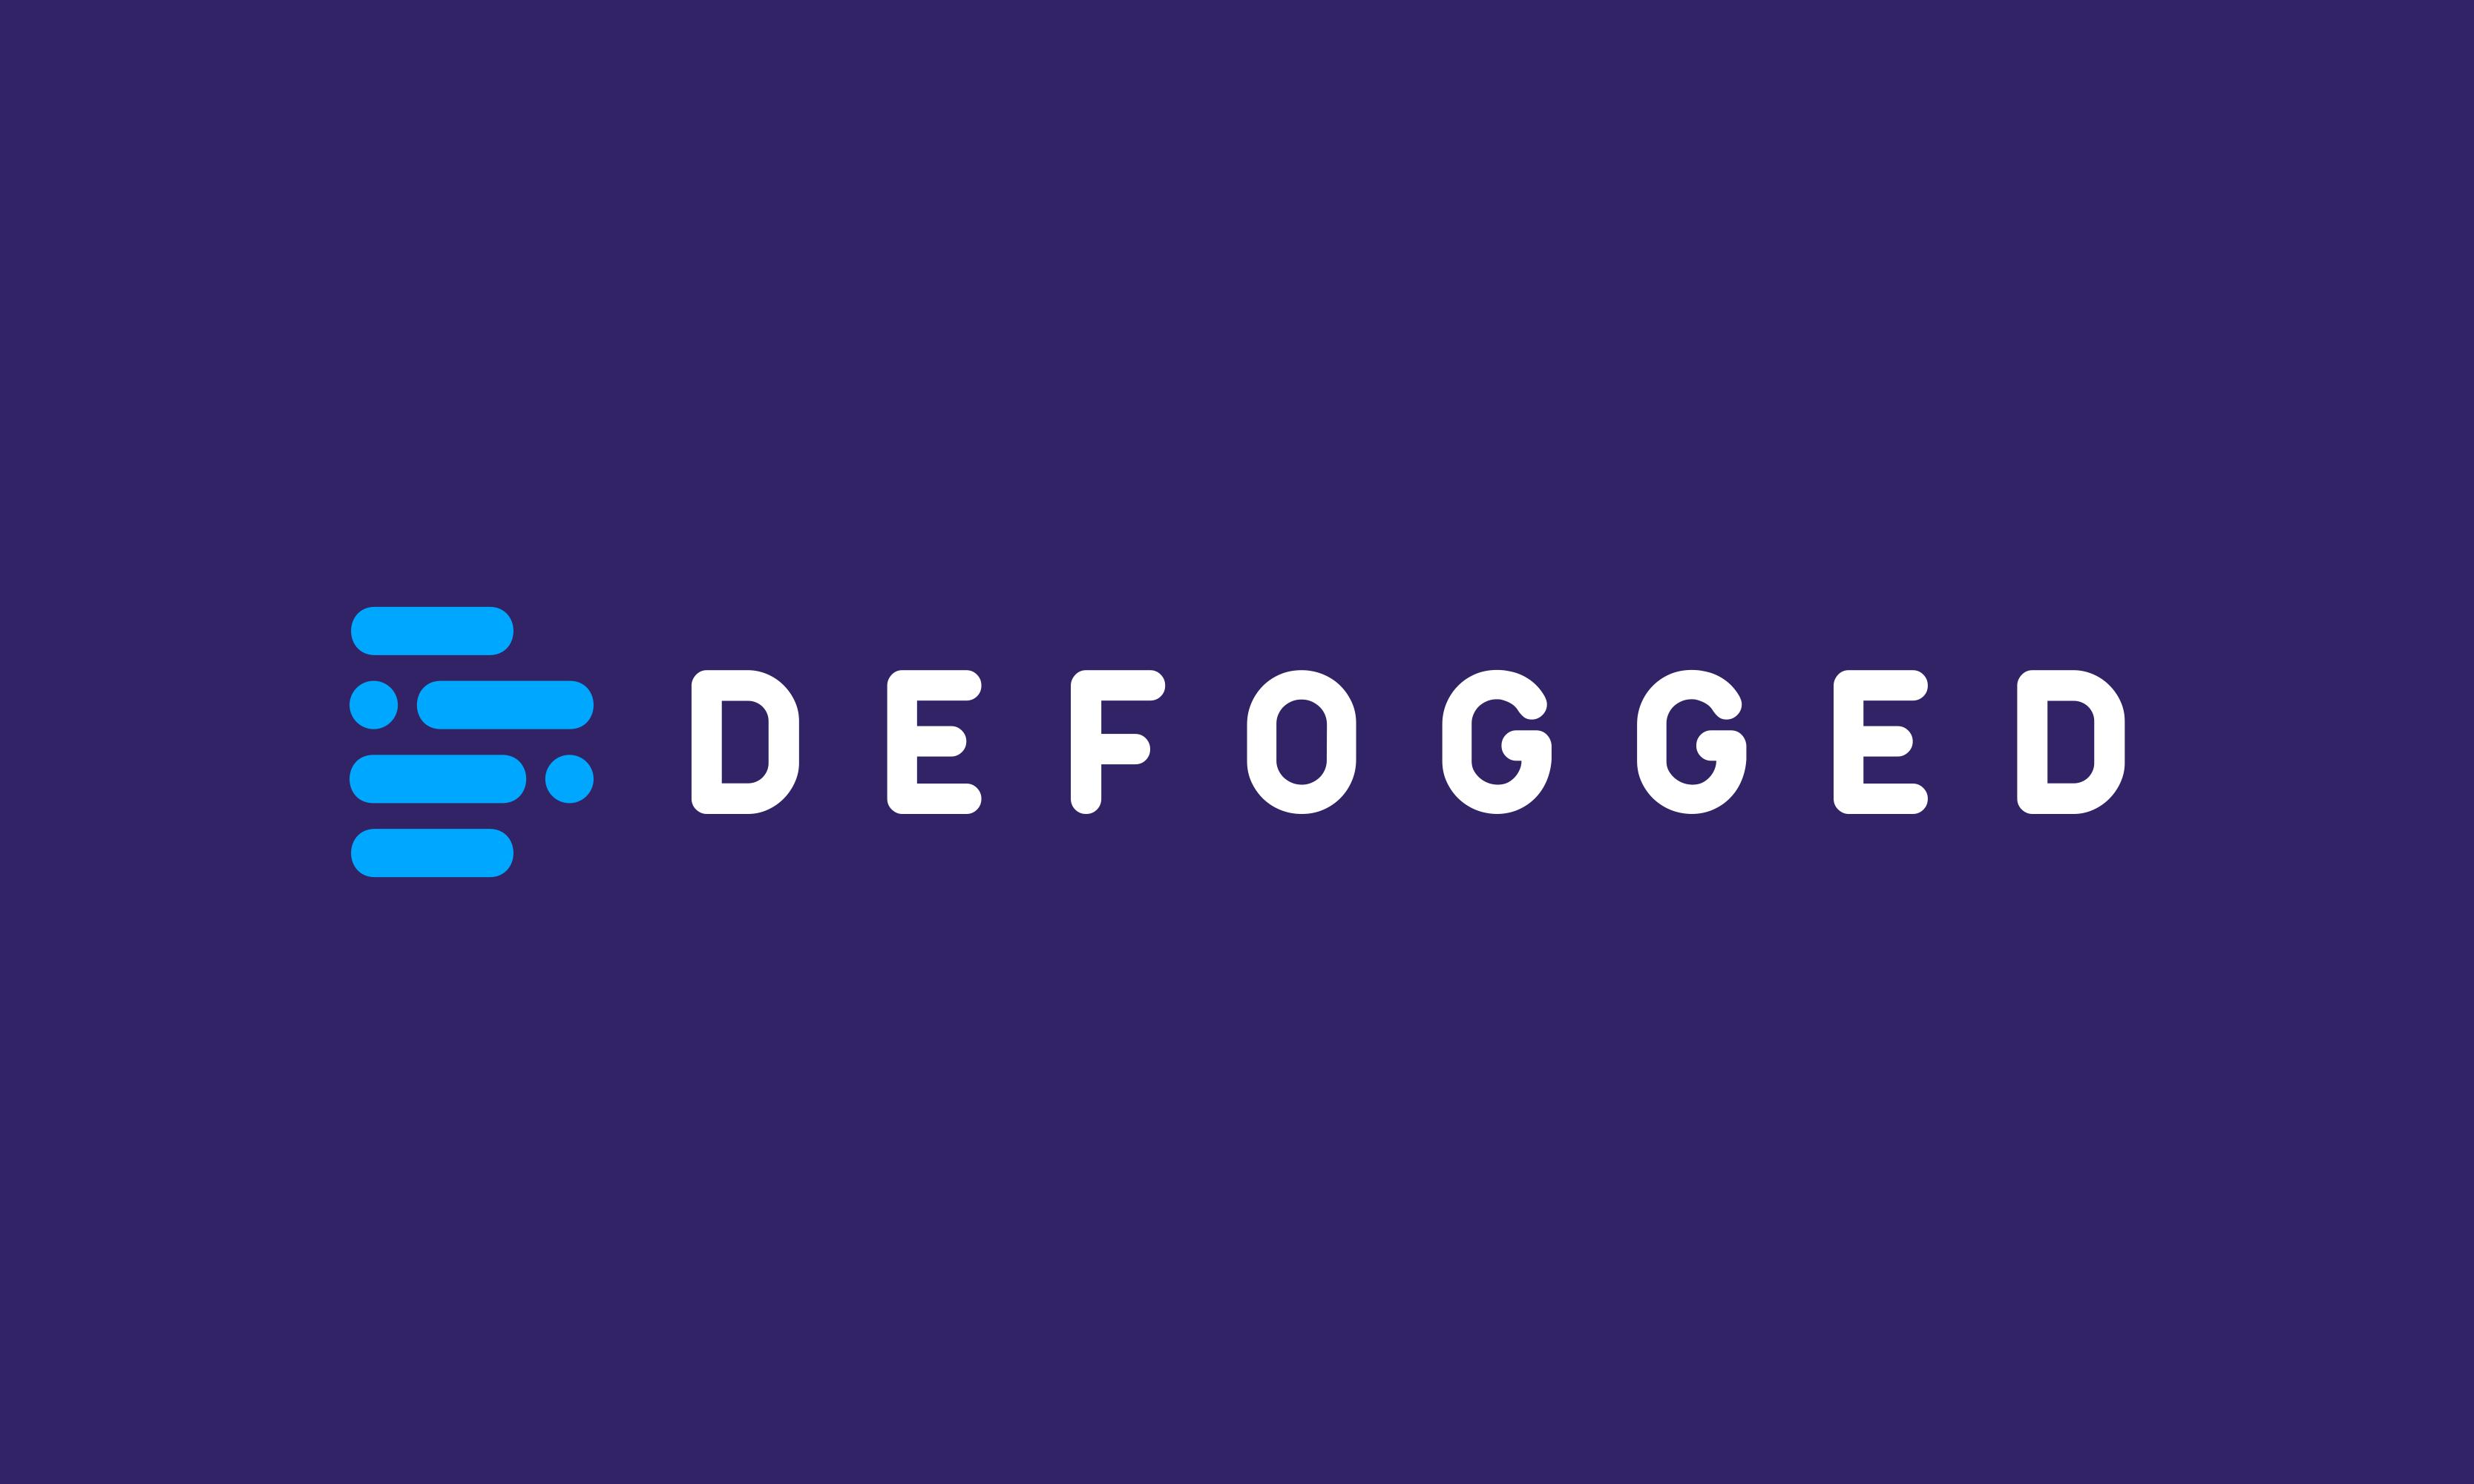 Defogged